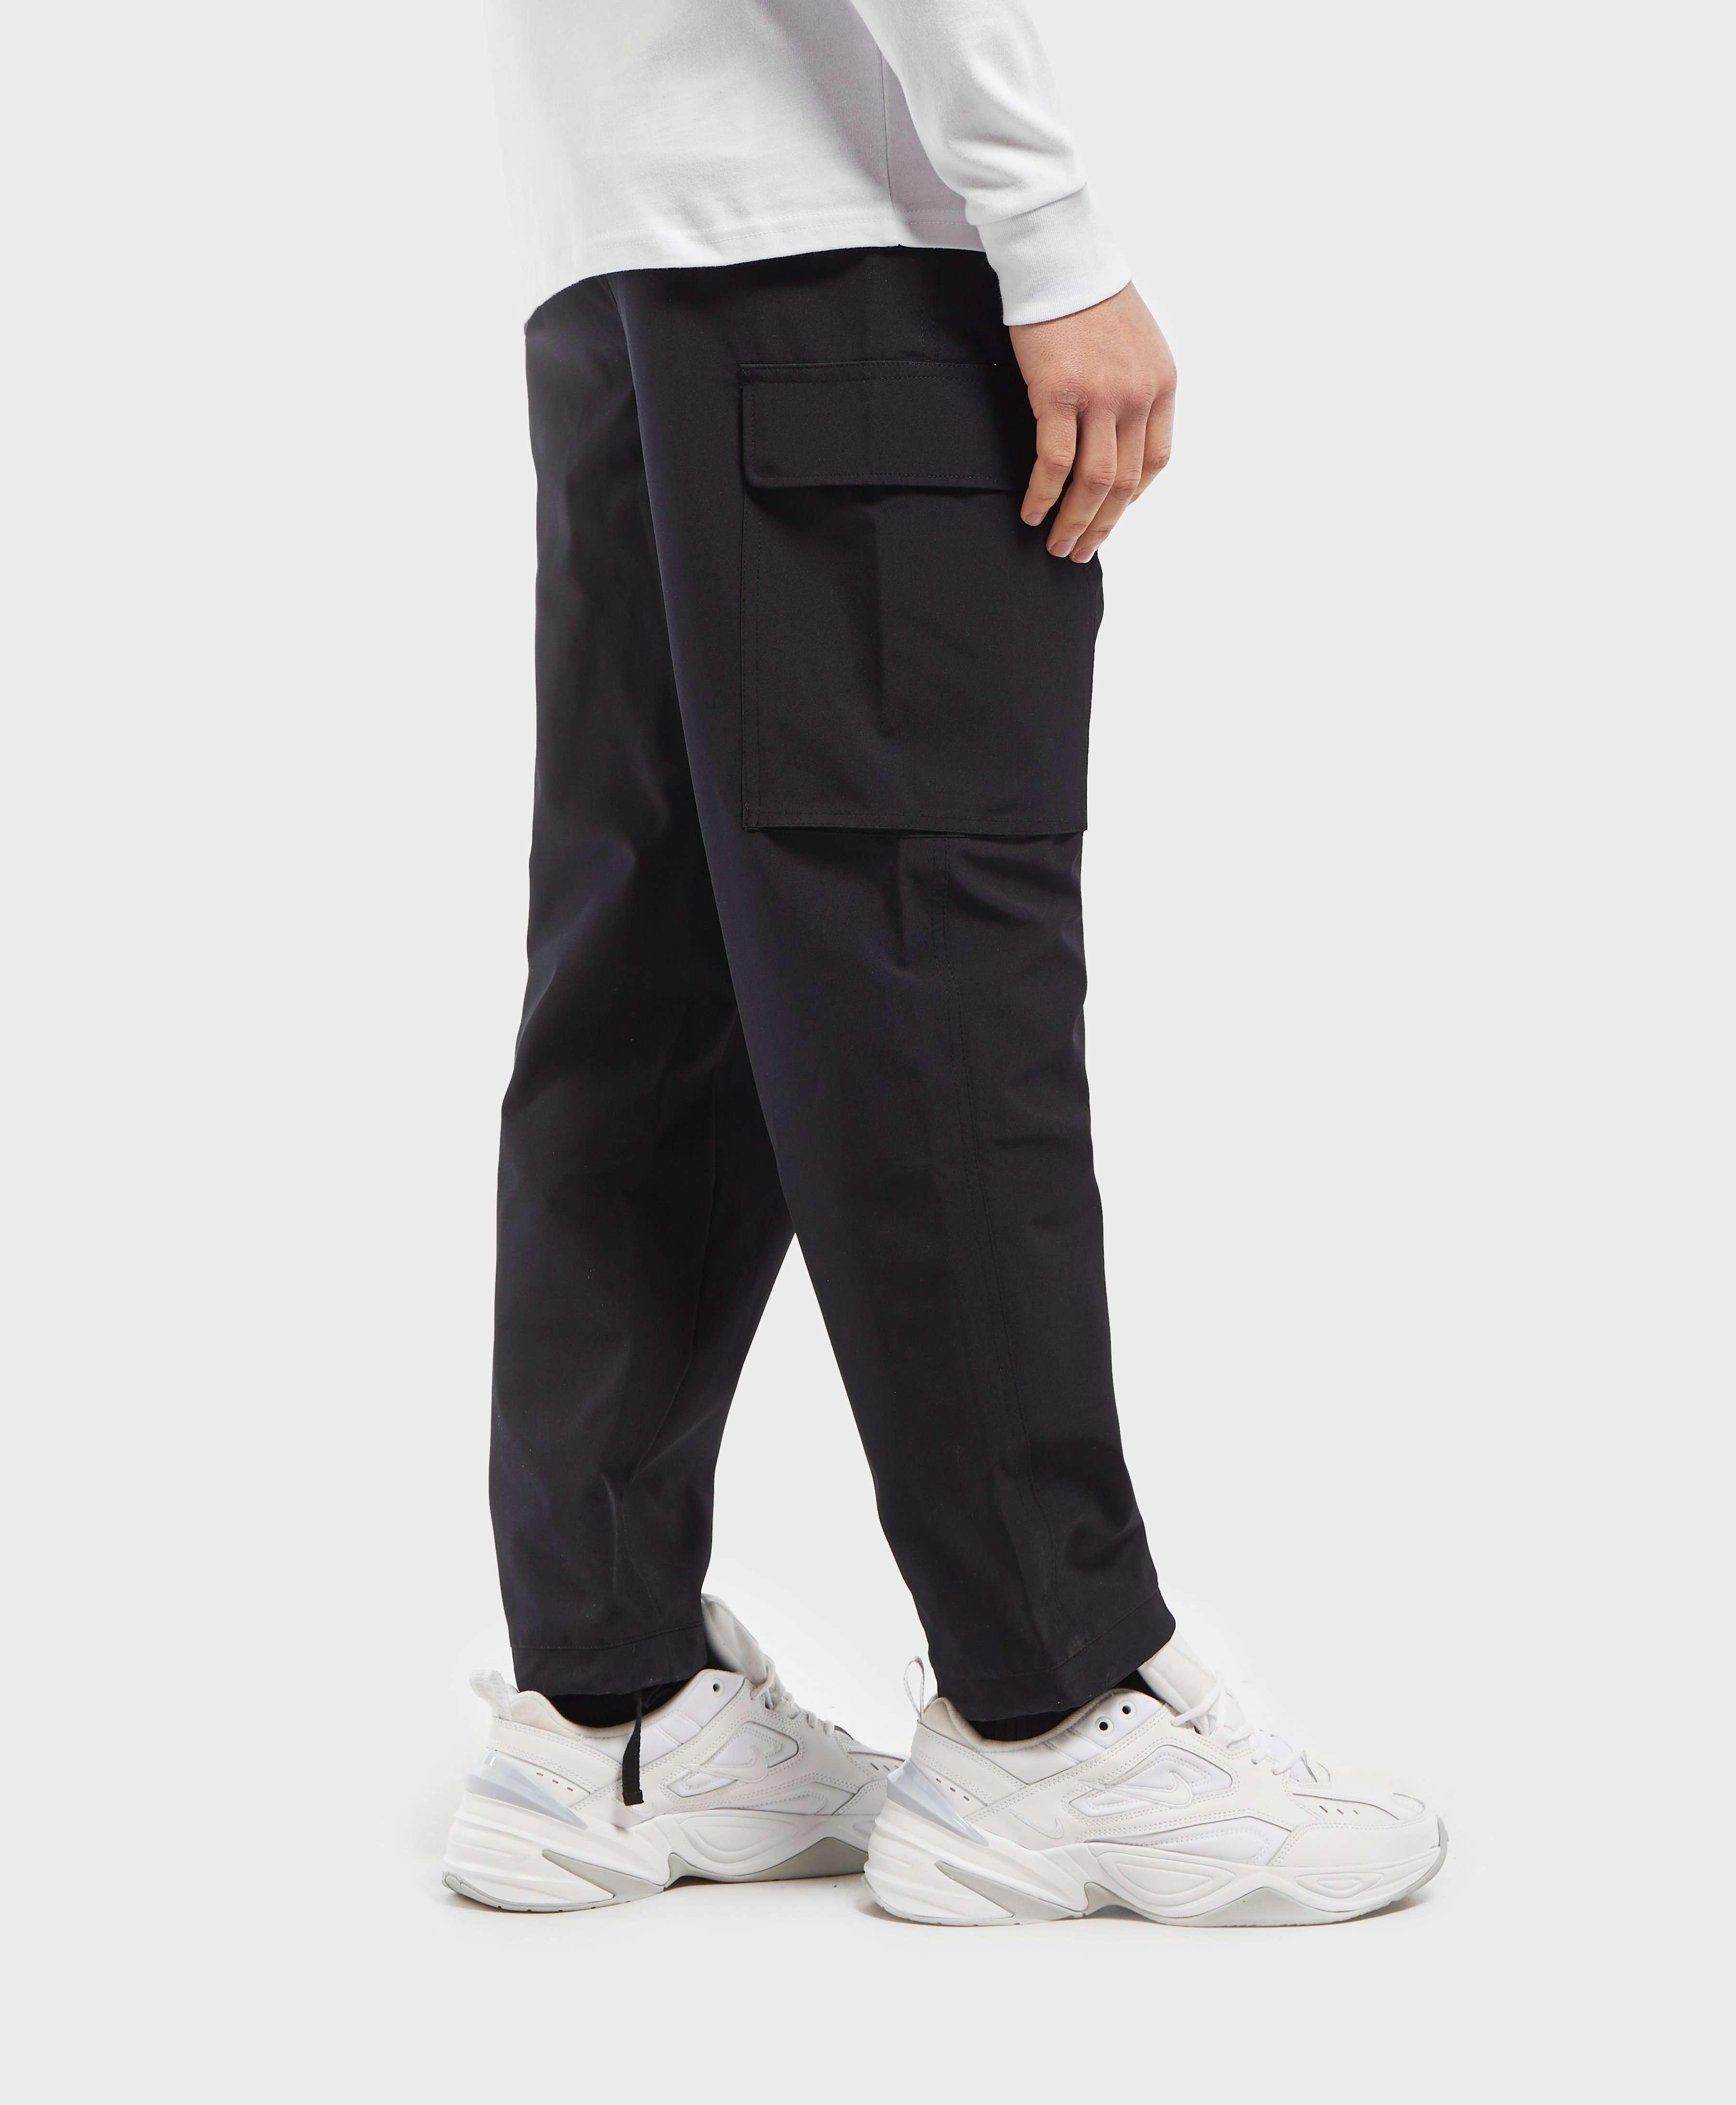 Fila Youla Cargo Pants